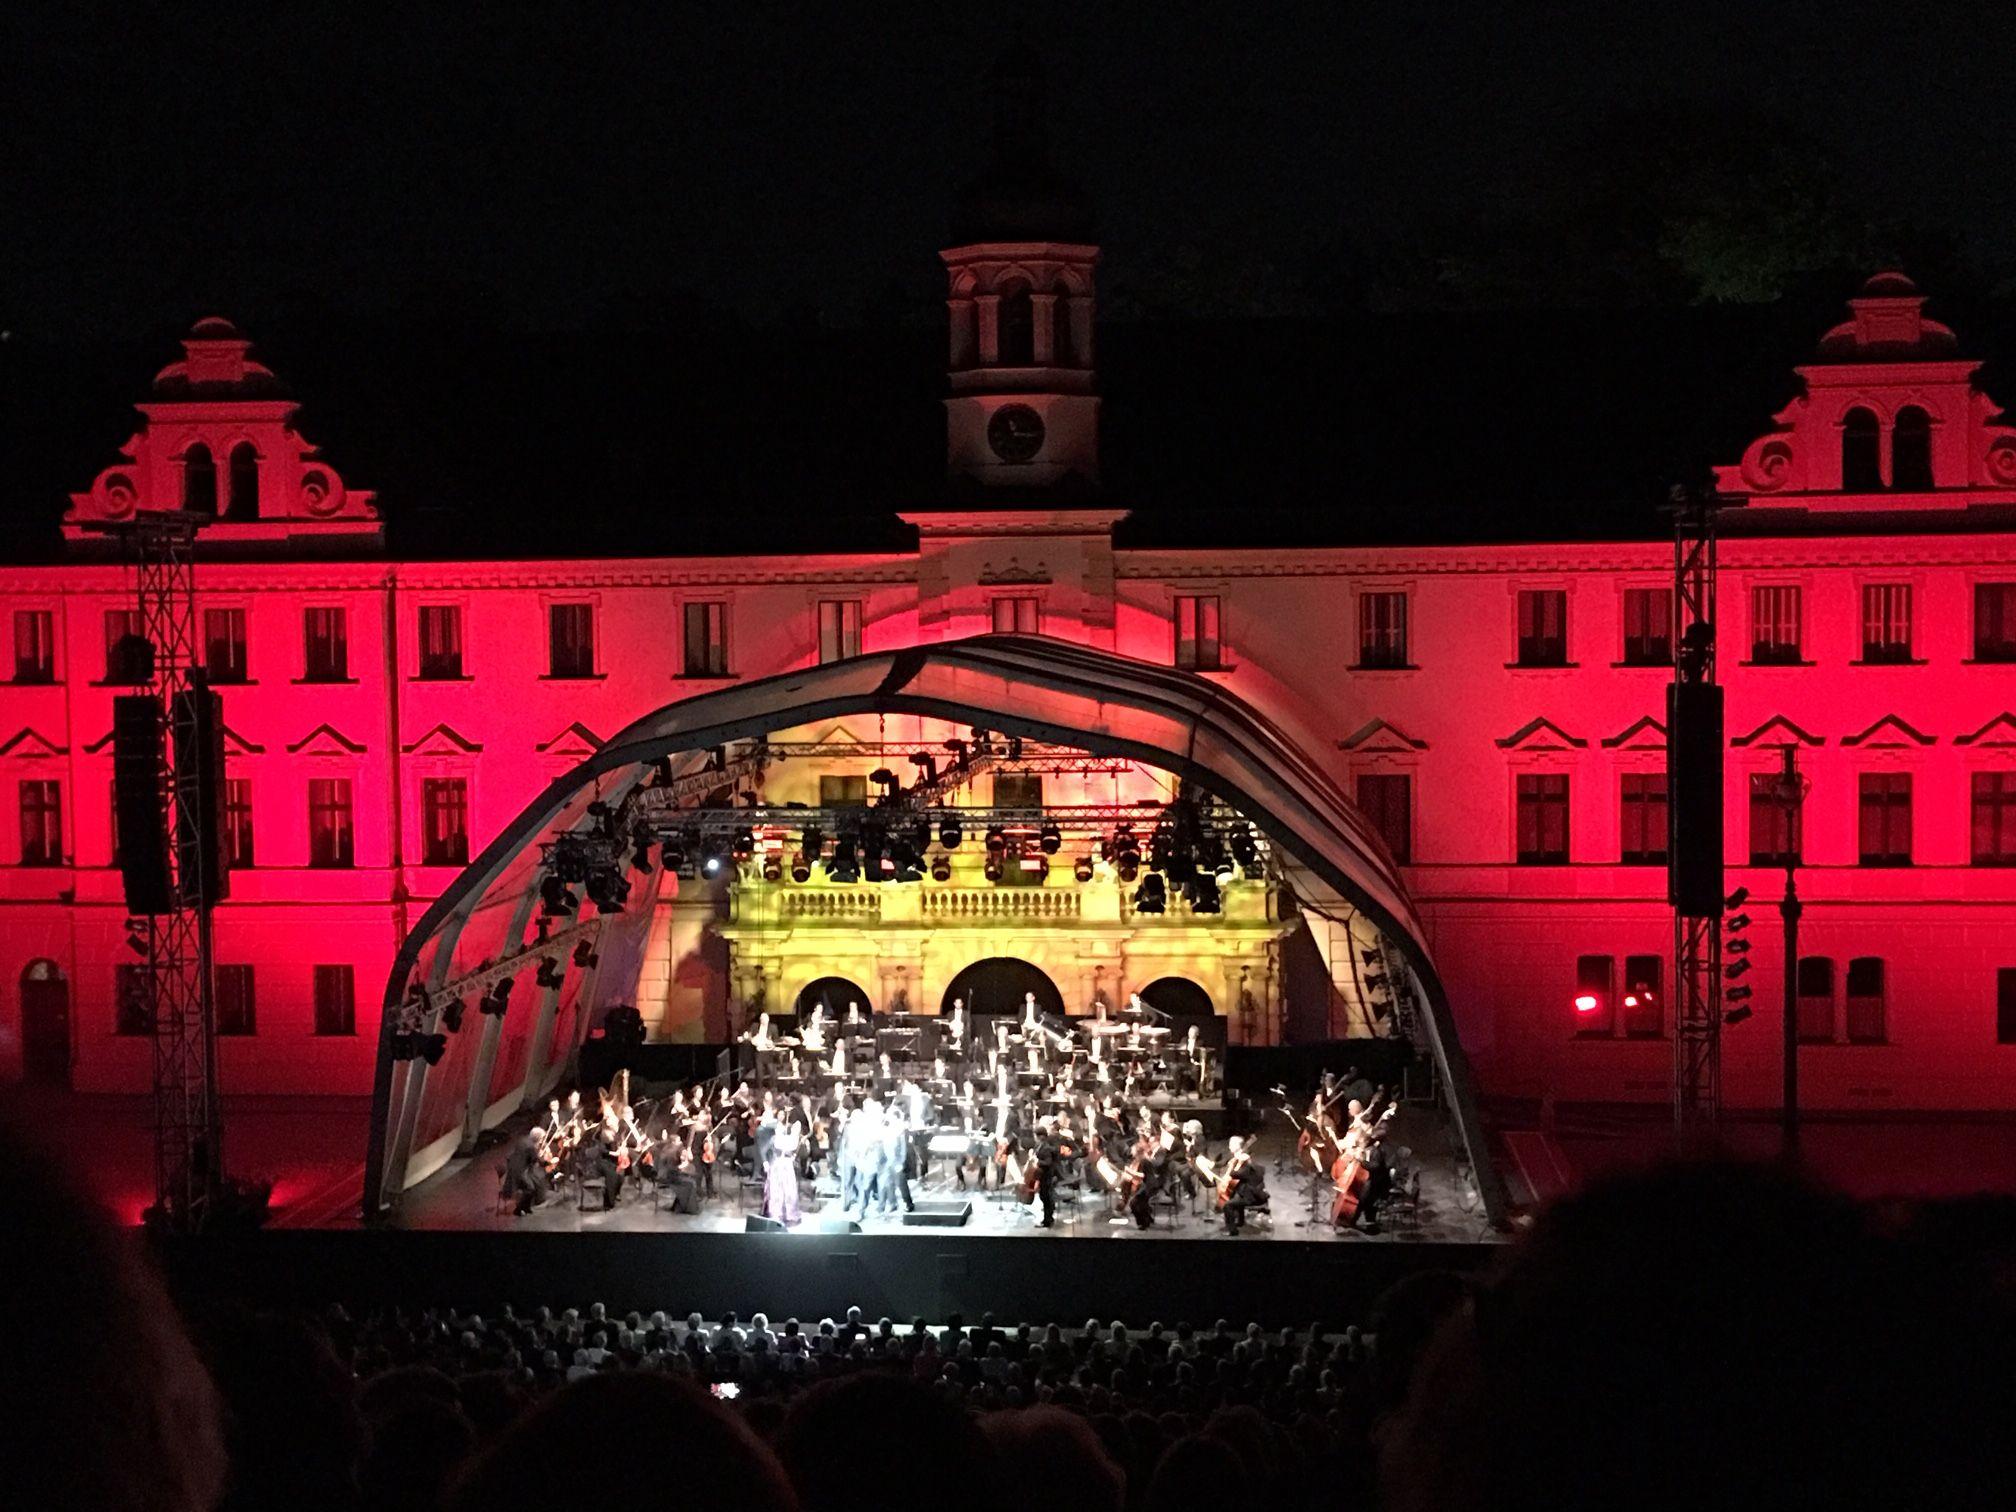 Festspiele Regensburg